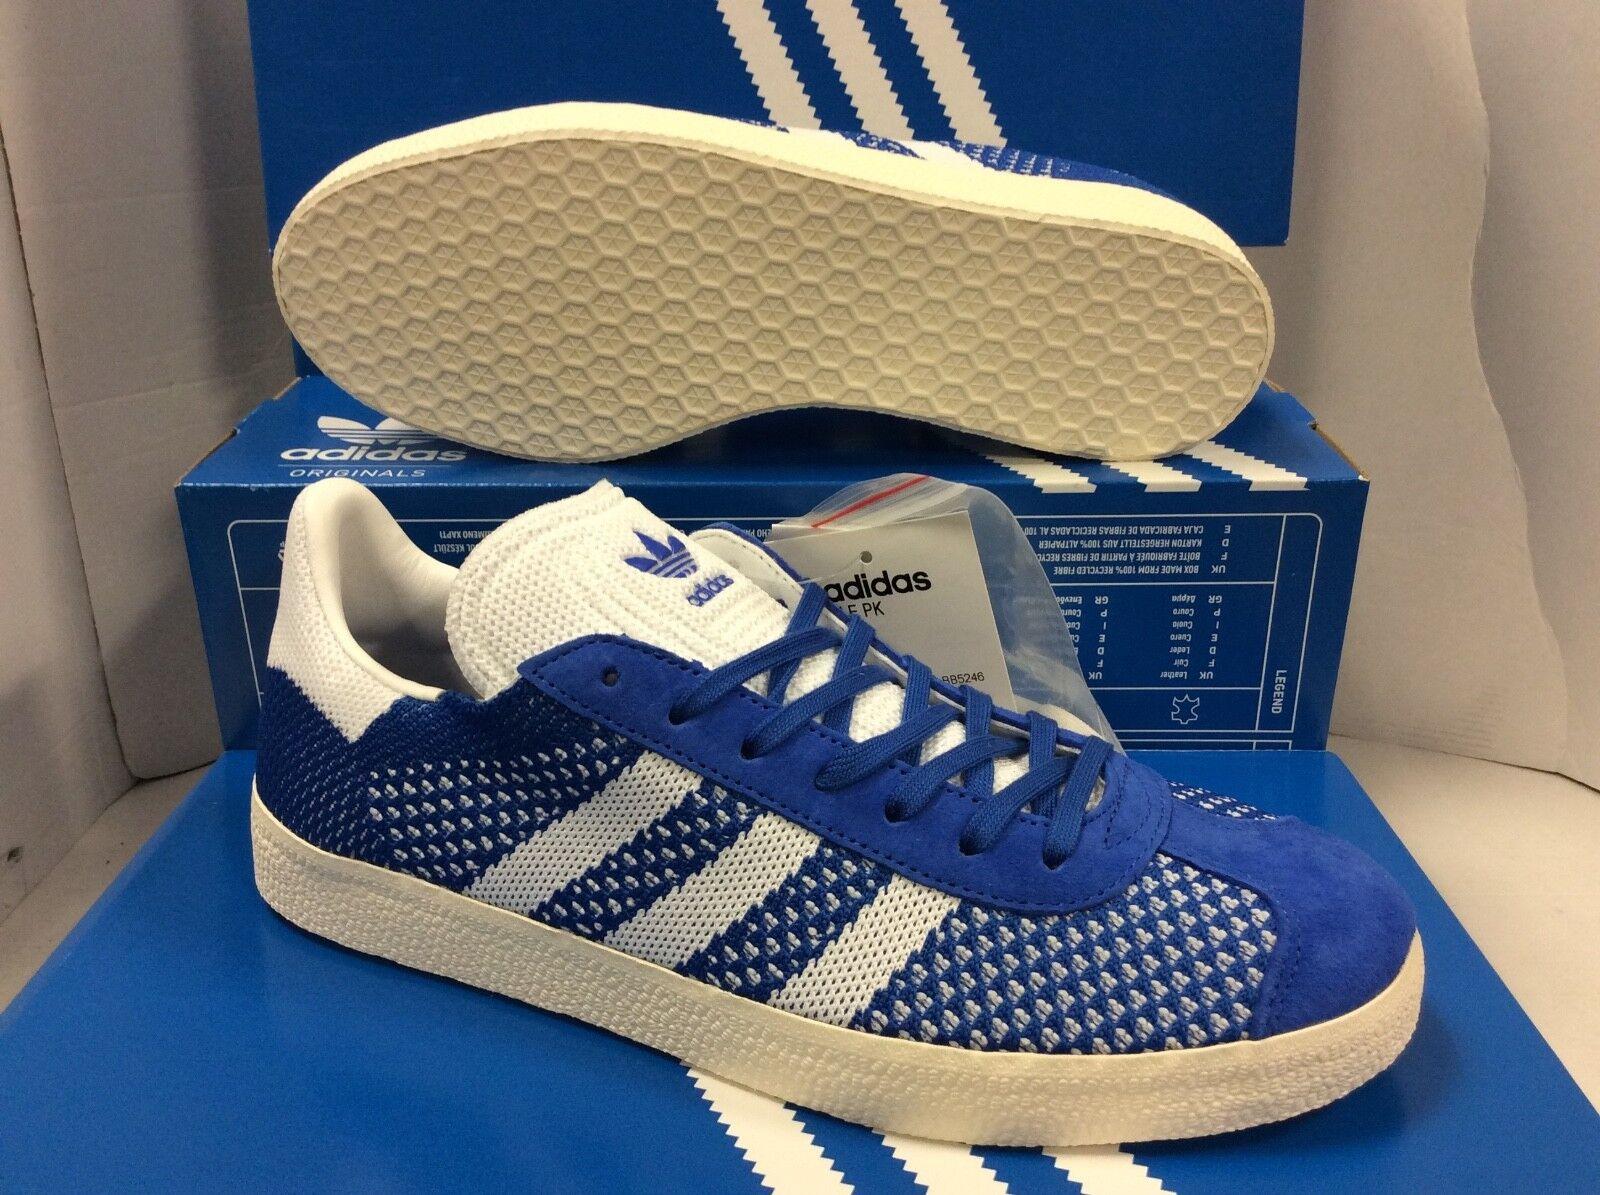 Adidas Originals Gazelle PK BB5246 para Hombre Tenis, Talla   USA 7